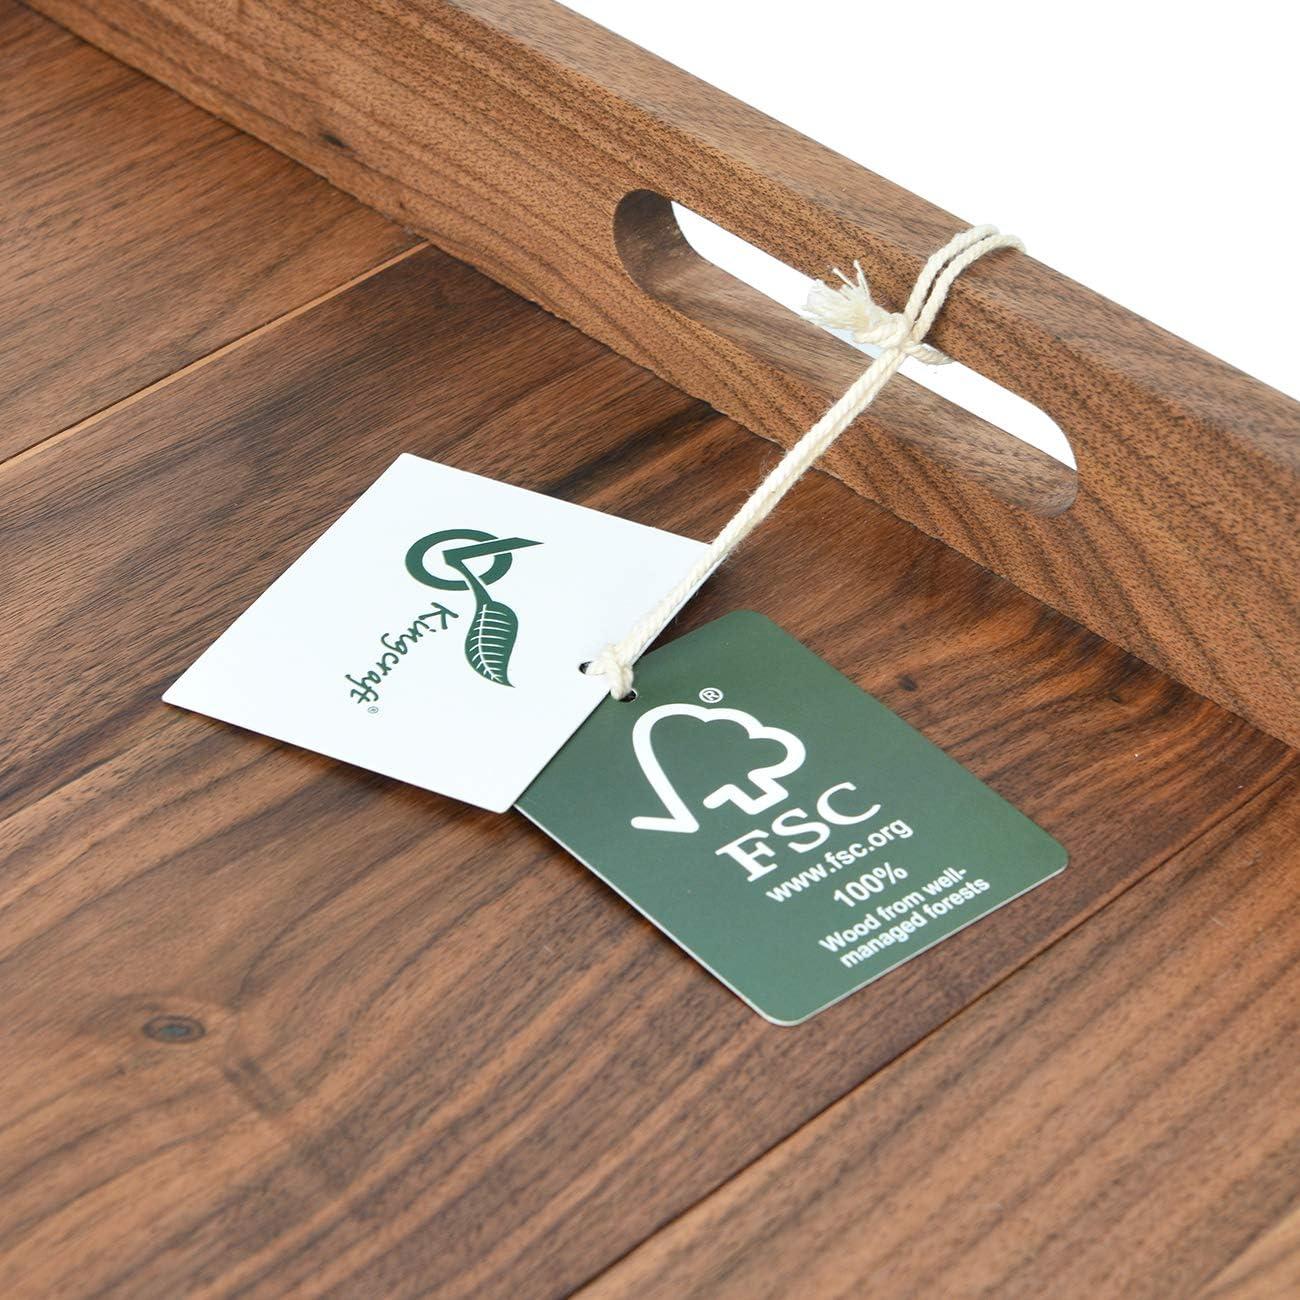 Ottoman tray wood with handles walnut 24 x 24 extra large serving tray walnut